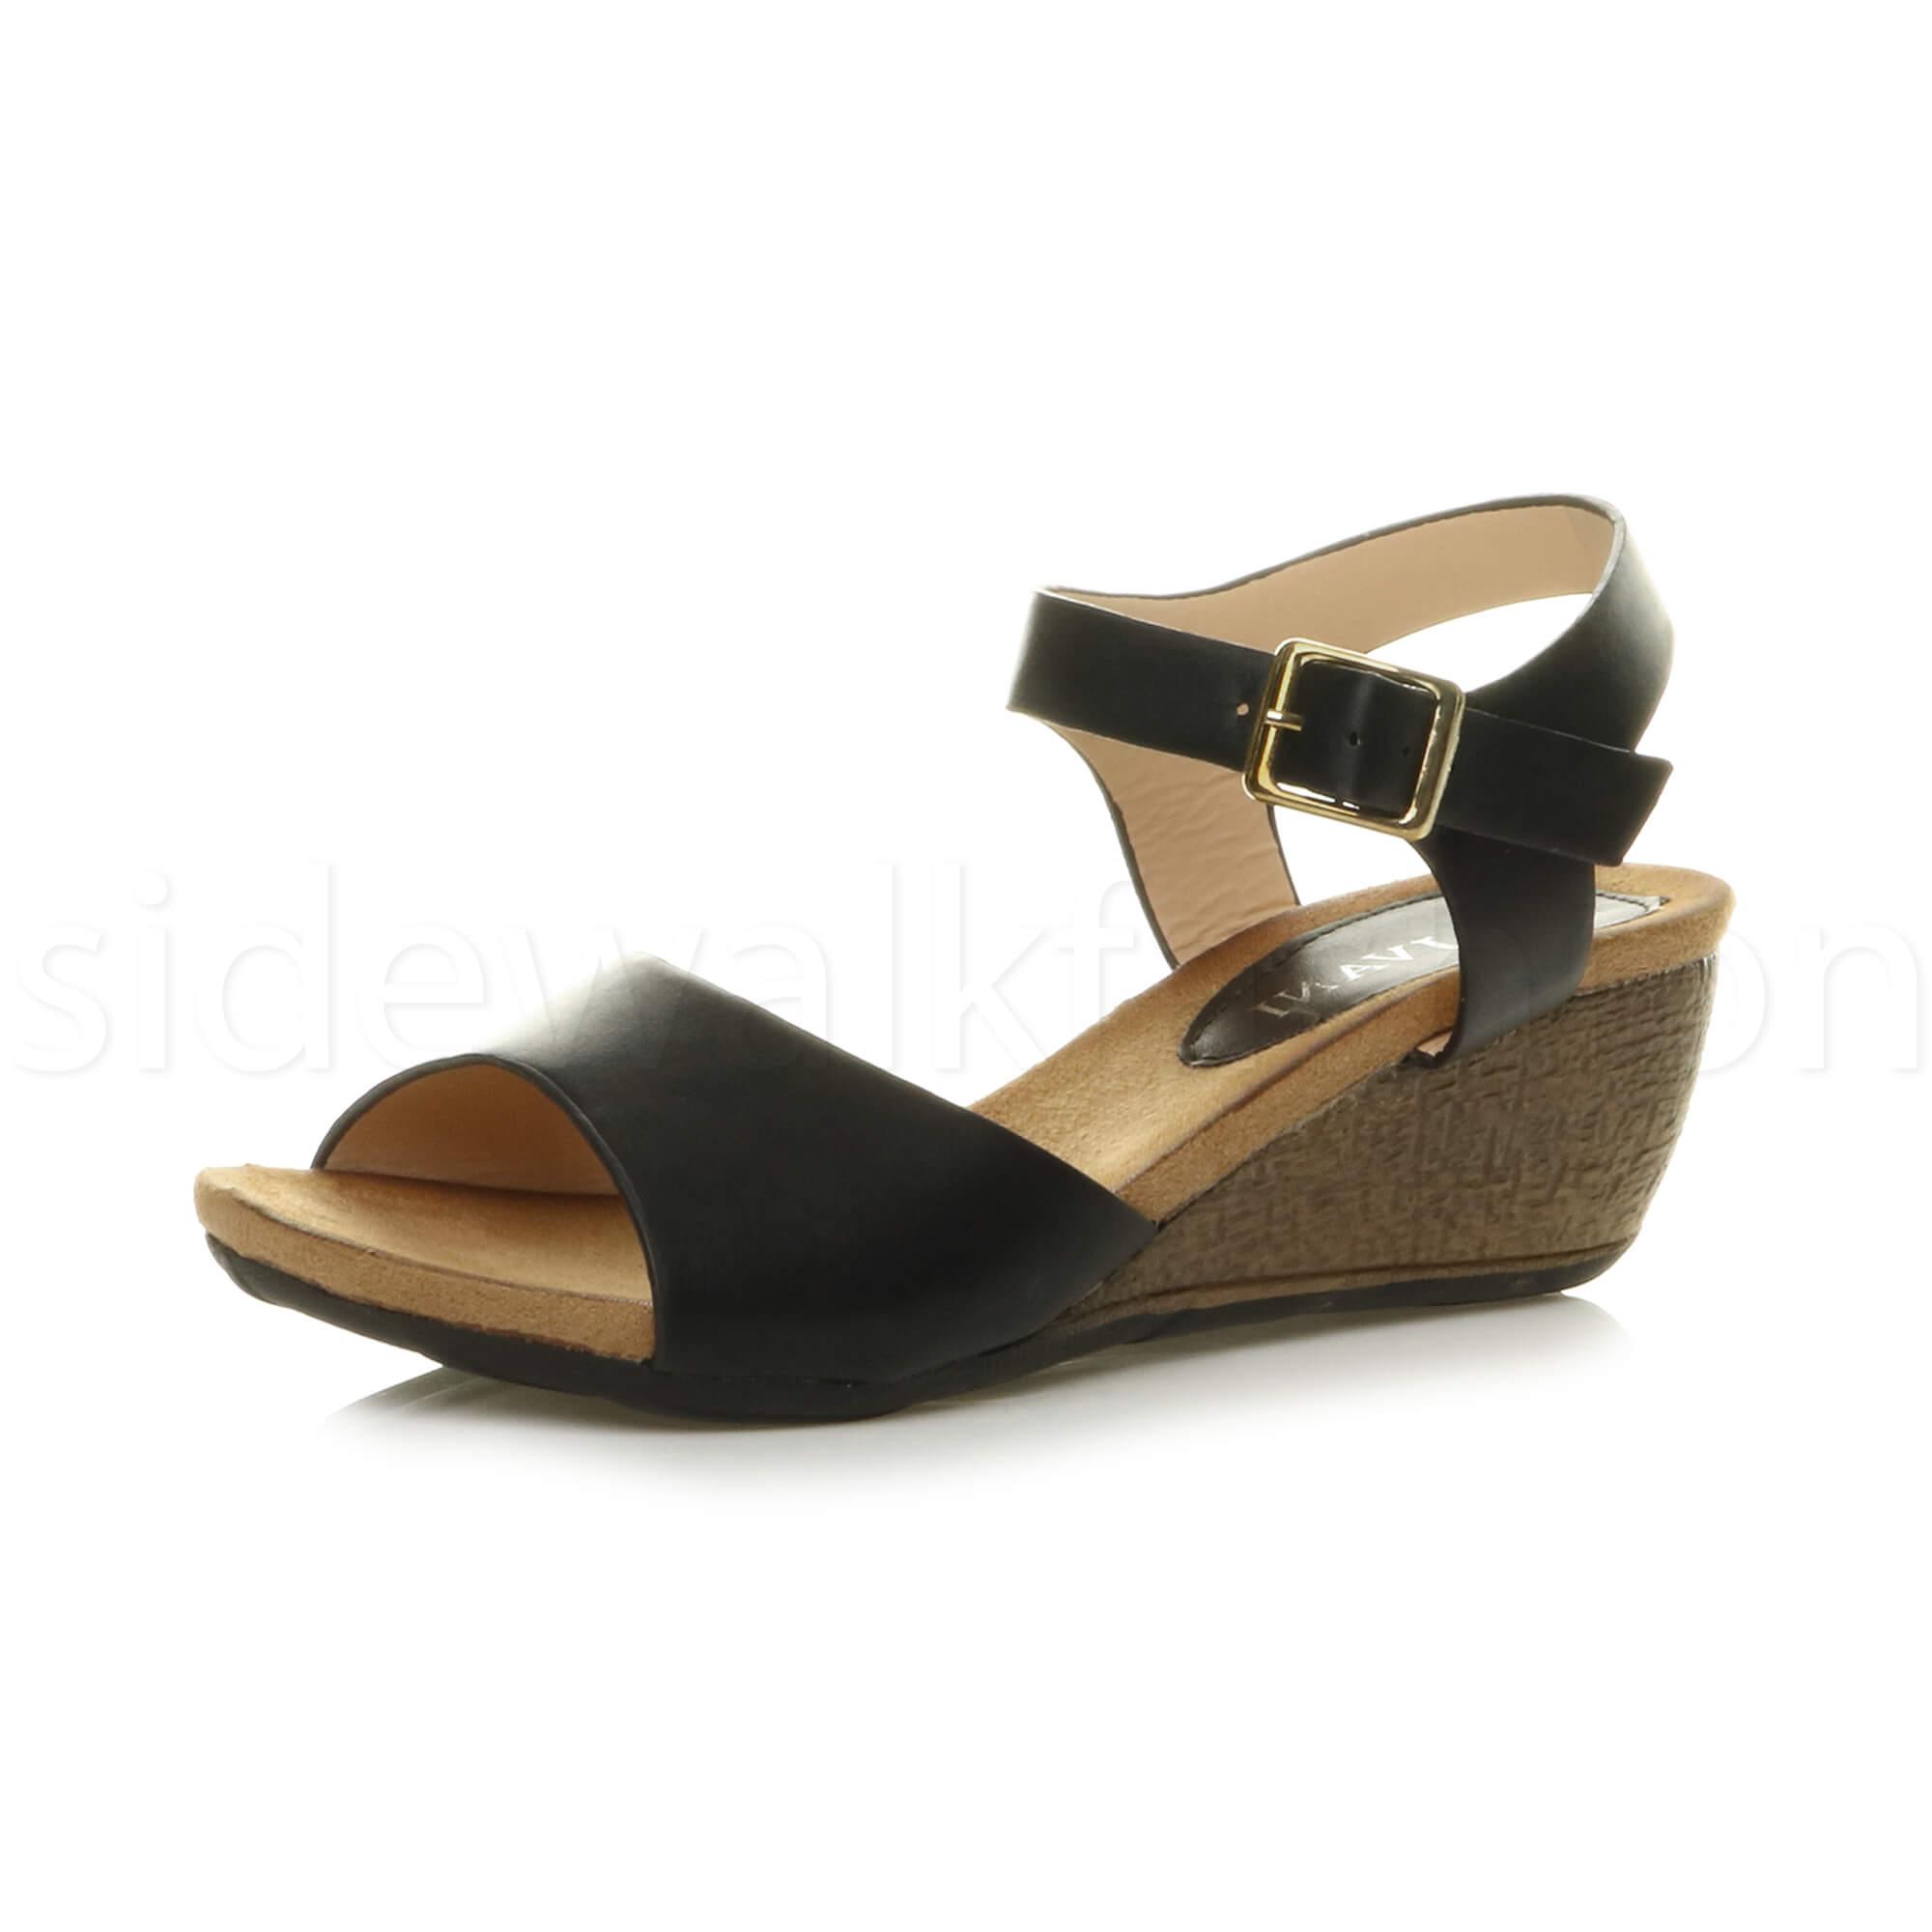 sale shoes asp comforter wedding to up wedge discountsdiscounts home comfortable